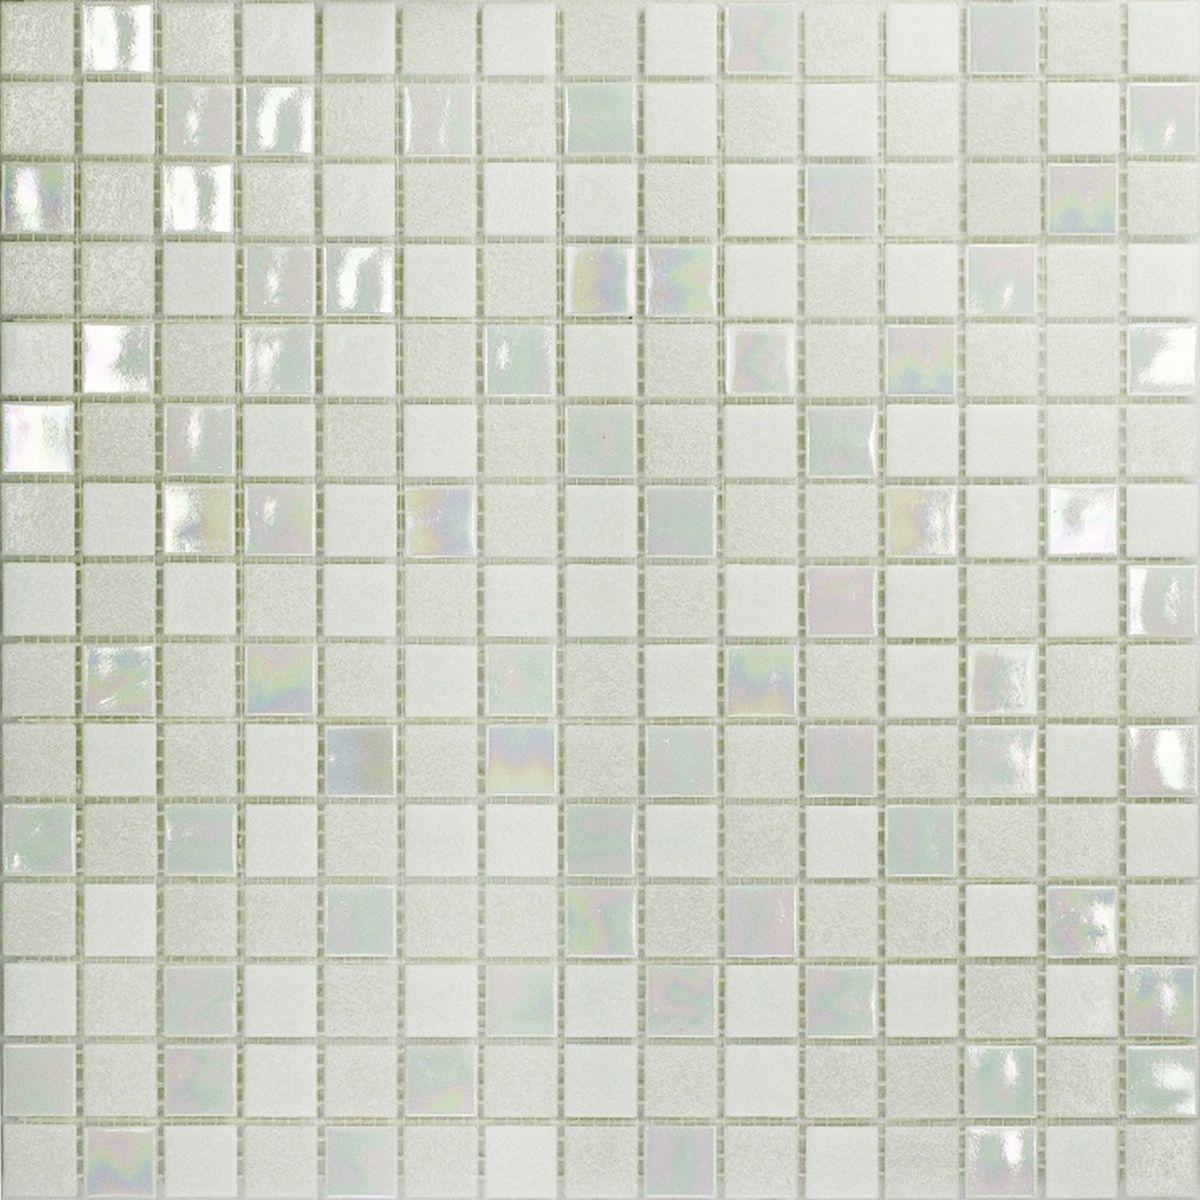 Piastrelle bagno mosaico leroy merlin elegant piastrelle bagno economiche leroy merlin with - Leroy merlin piastrelle mosaico ...